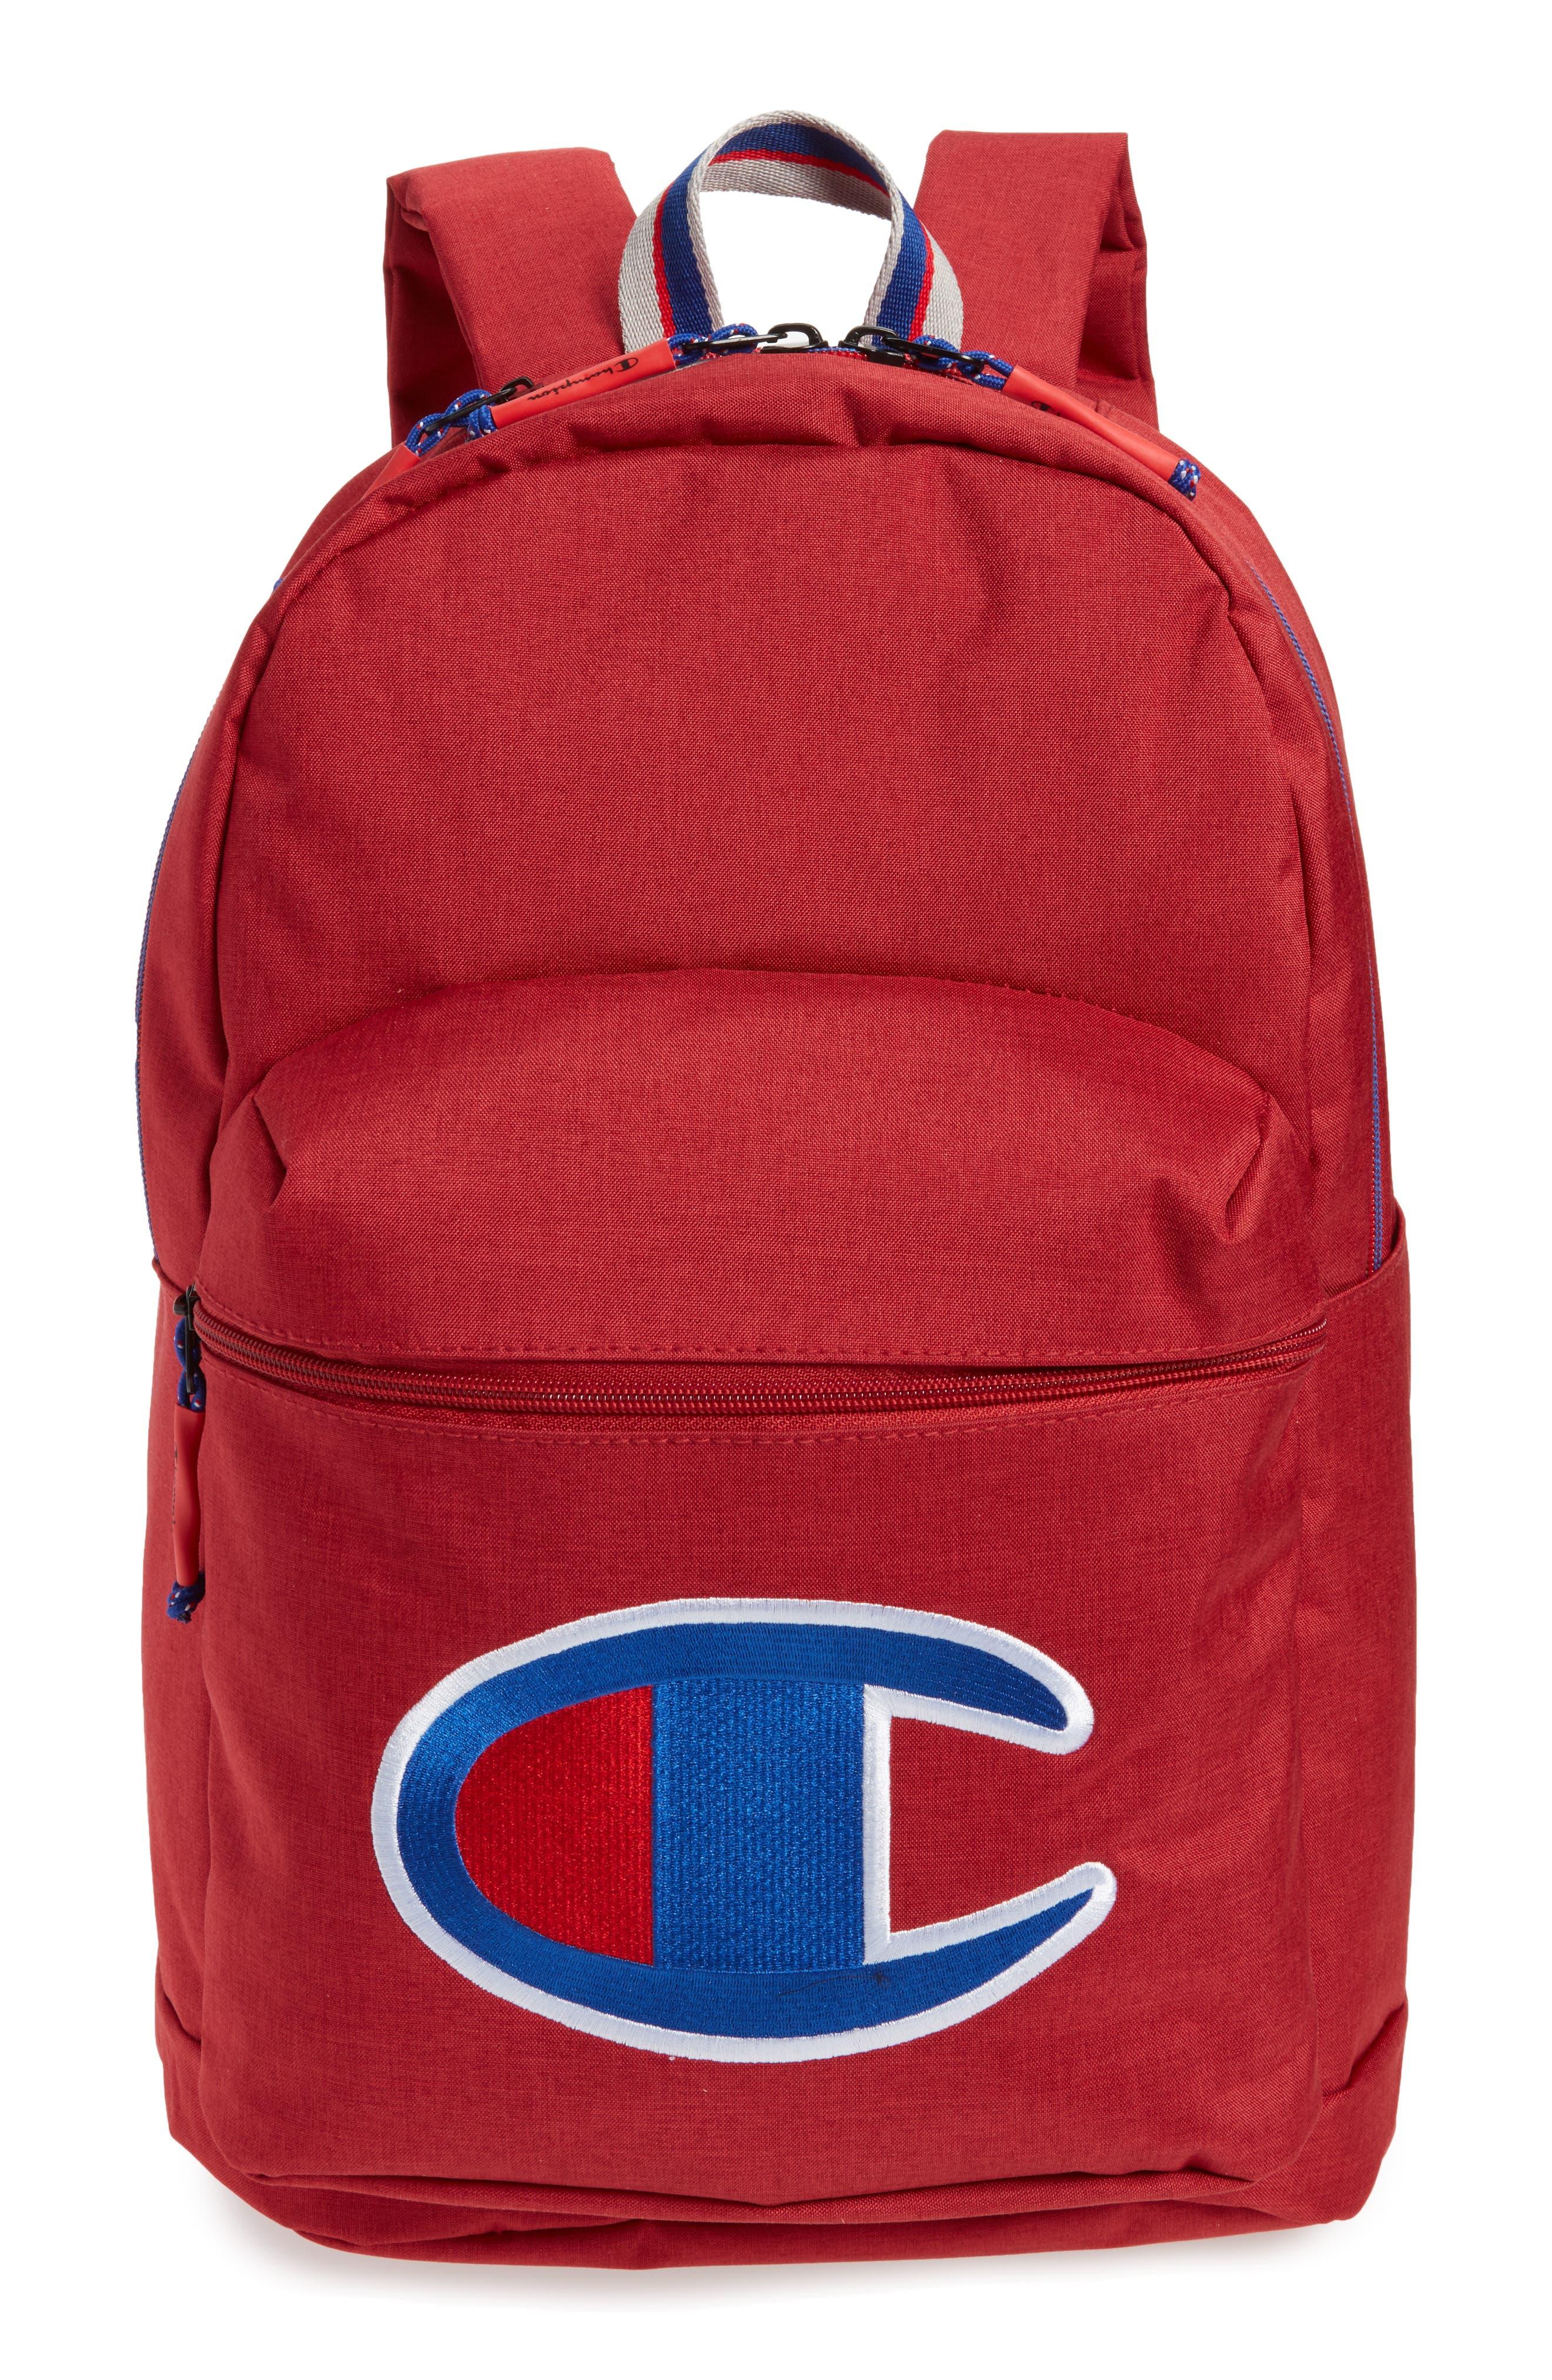 Supercize Backpack,                         Main,                         color, SCARLET HEATHER